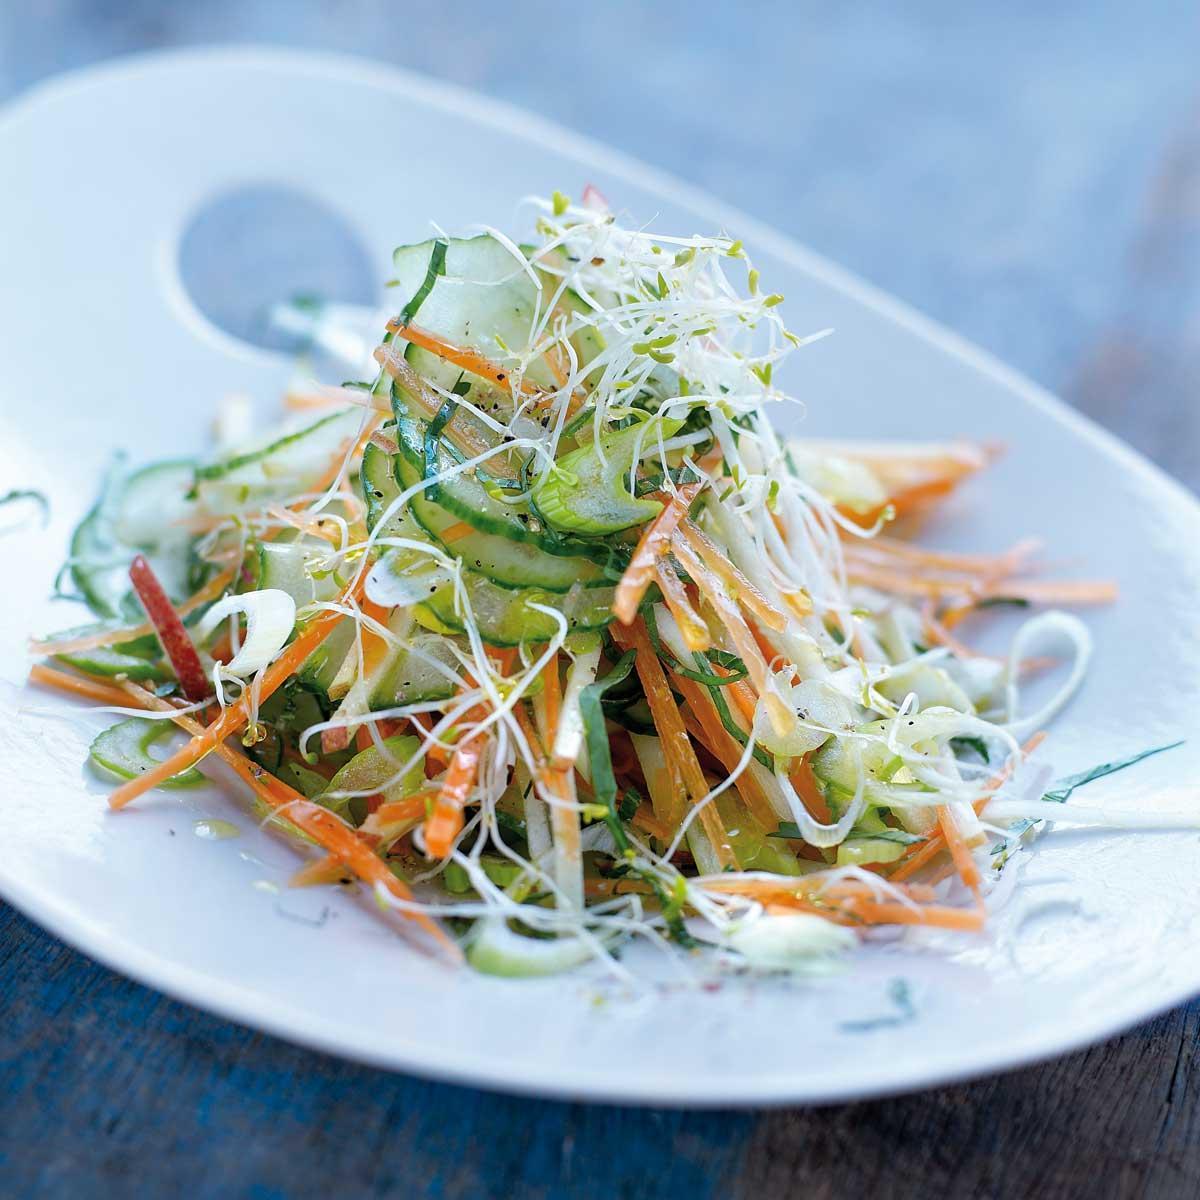 recette salade de concombre l asiatique cuisine madame figaro. Black Bedroom Furniture Sets. Home Design Ideas